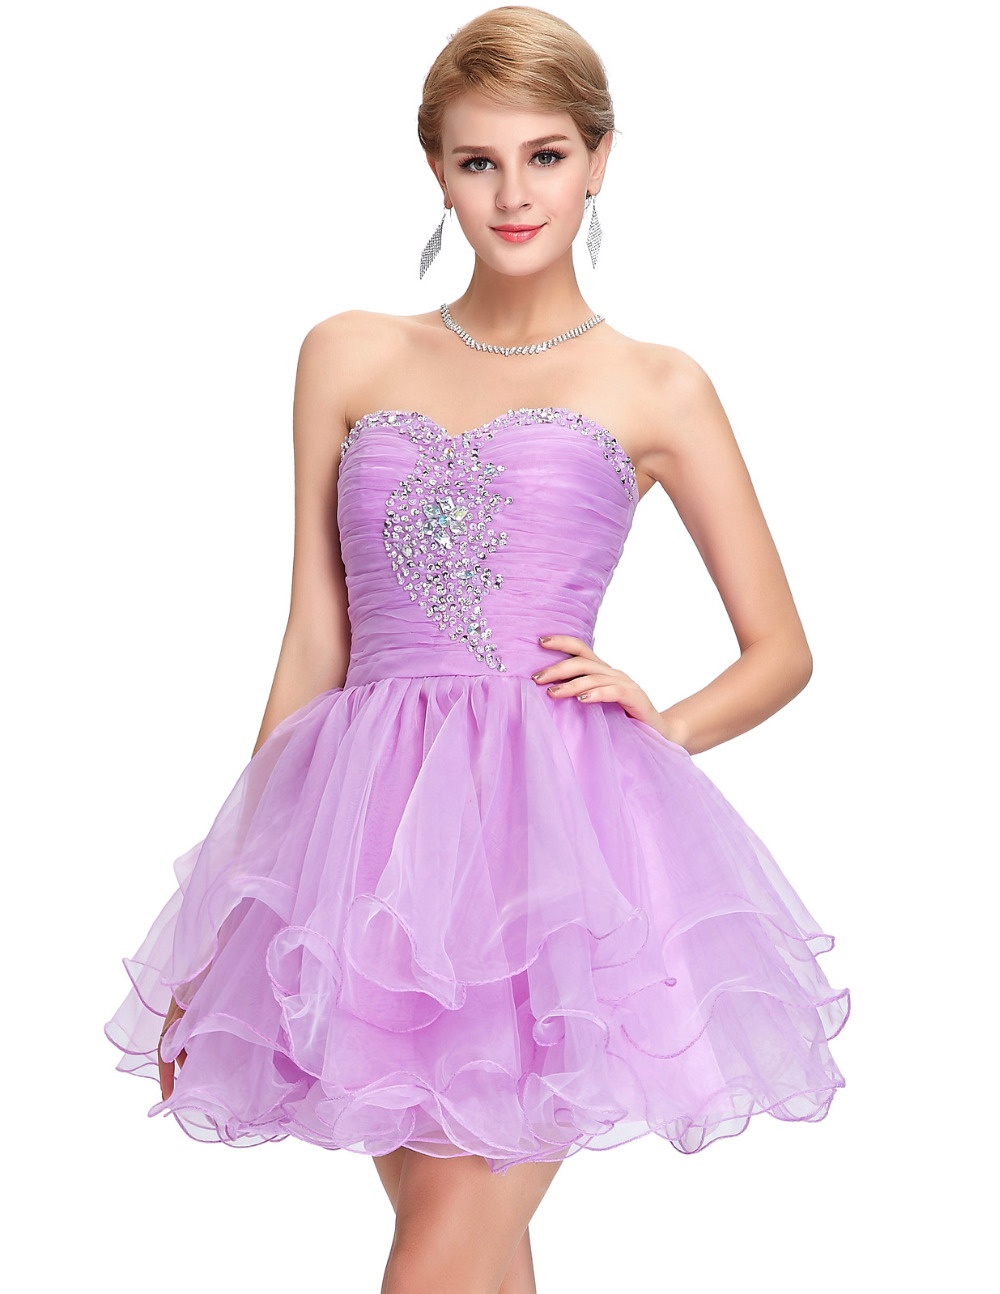 Short Evening Dresses Aliexpress - Eligent Prom Dresses